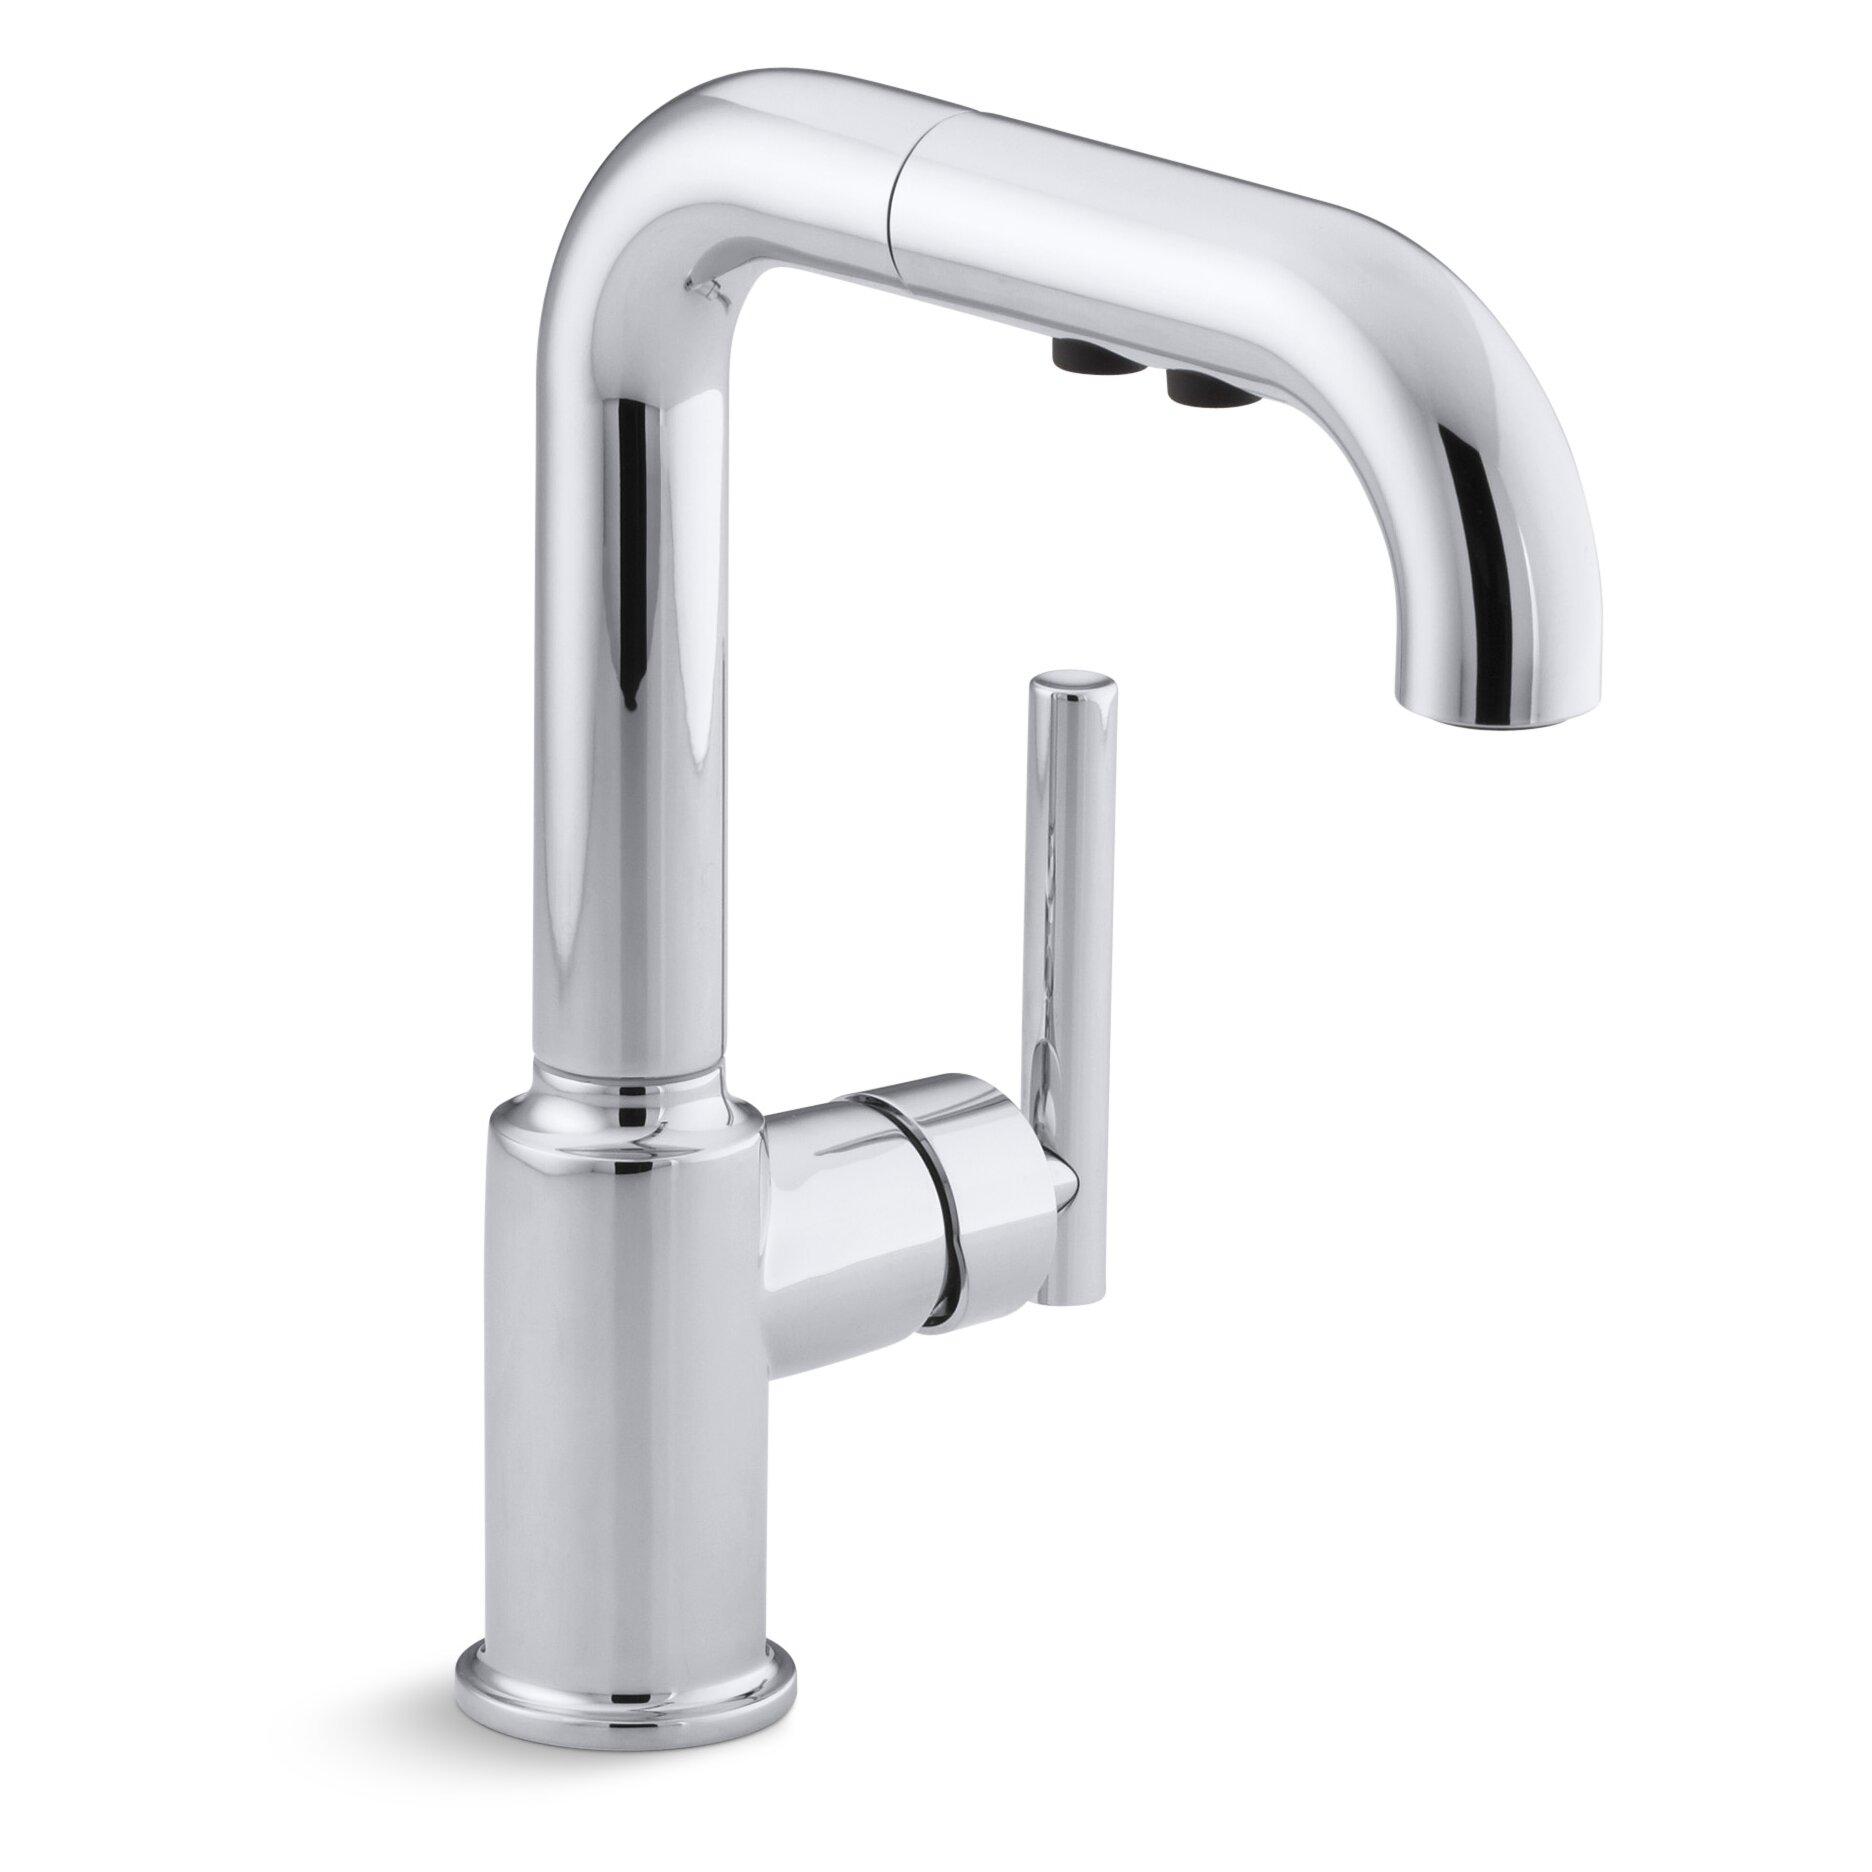 Purist Single Hole Kitchen Sink Faucet With  Pullout Spout